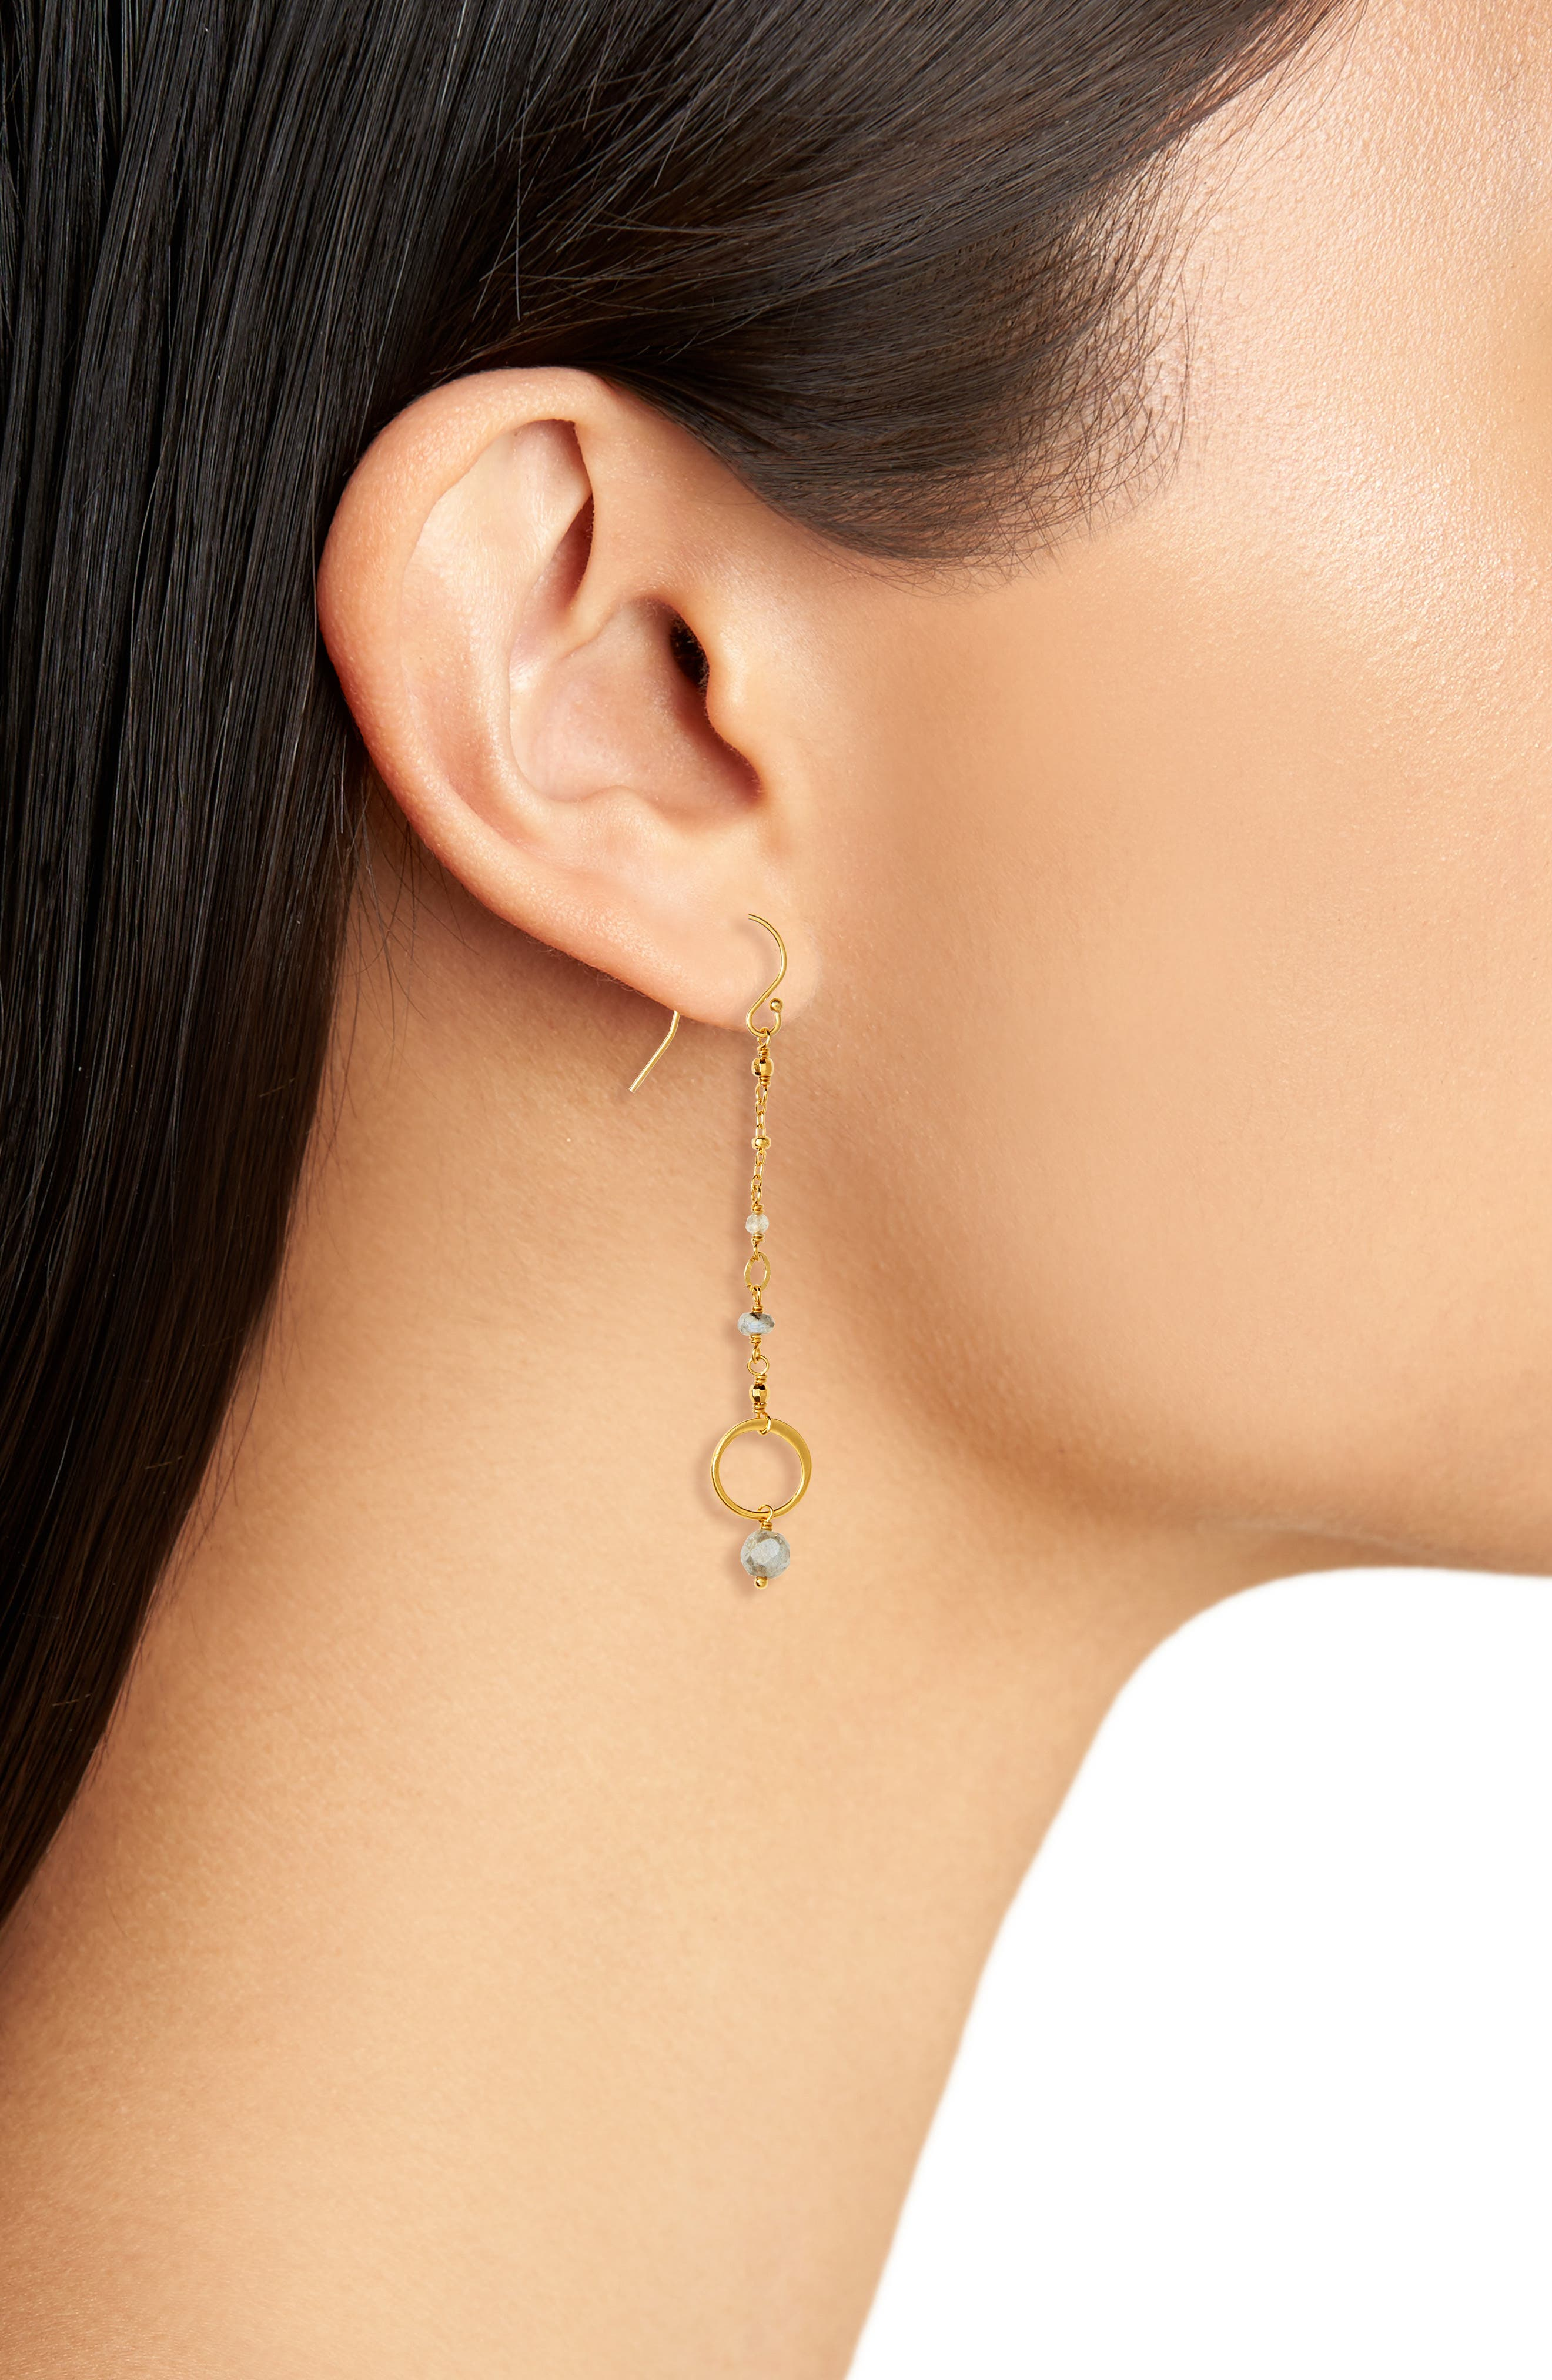 Drop Earrings,                             Alternate thumbnail 2, color,                             710